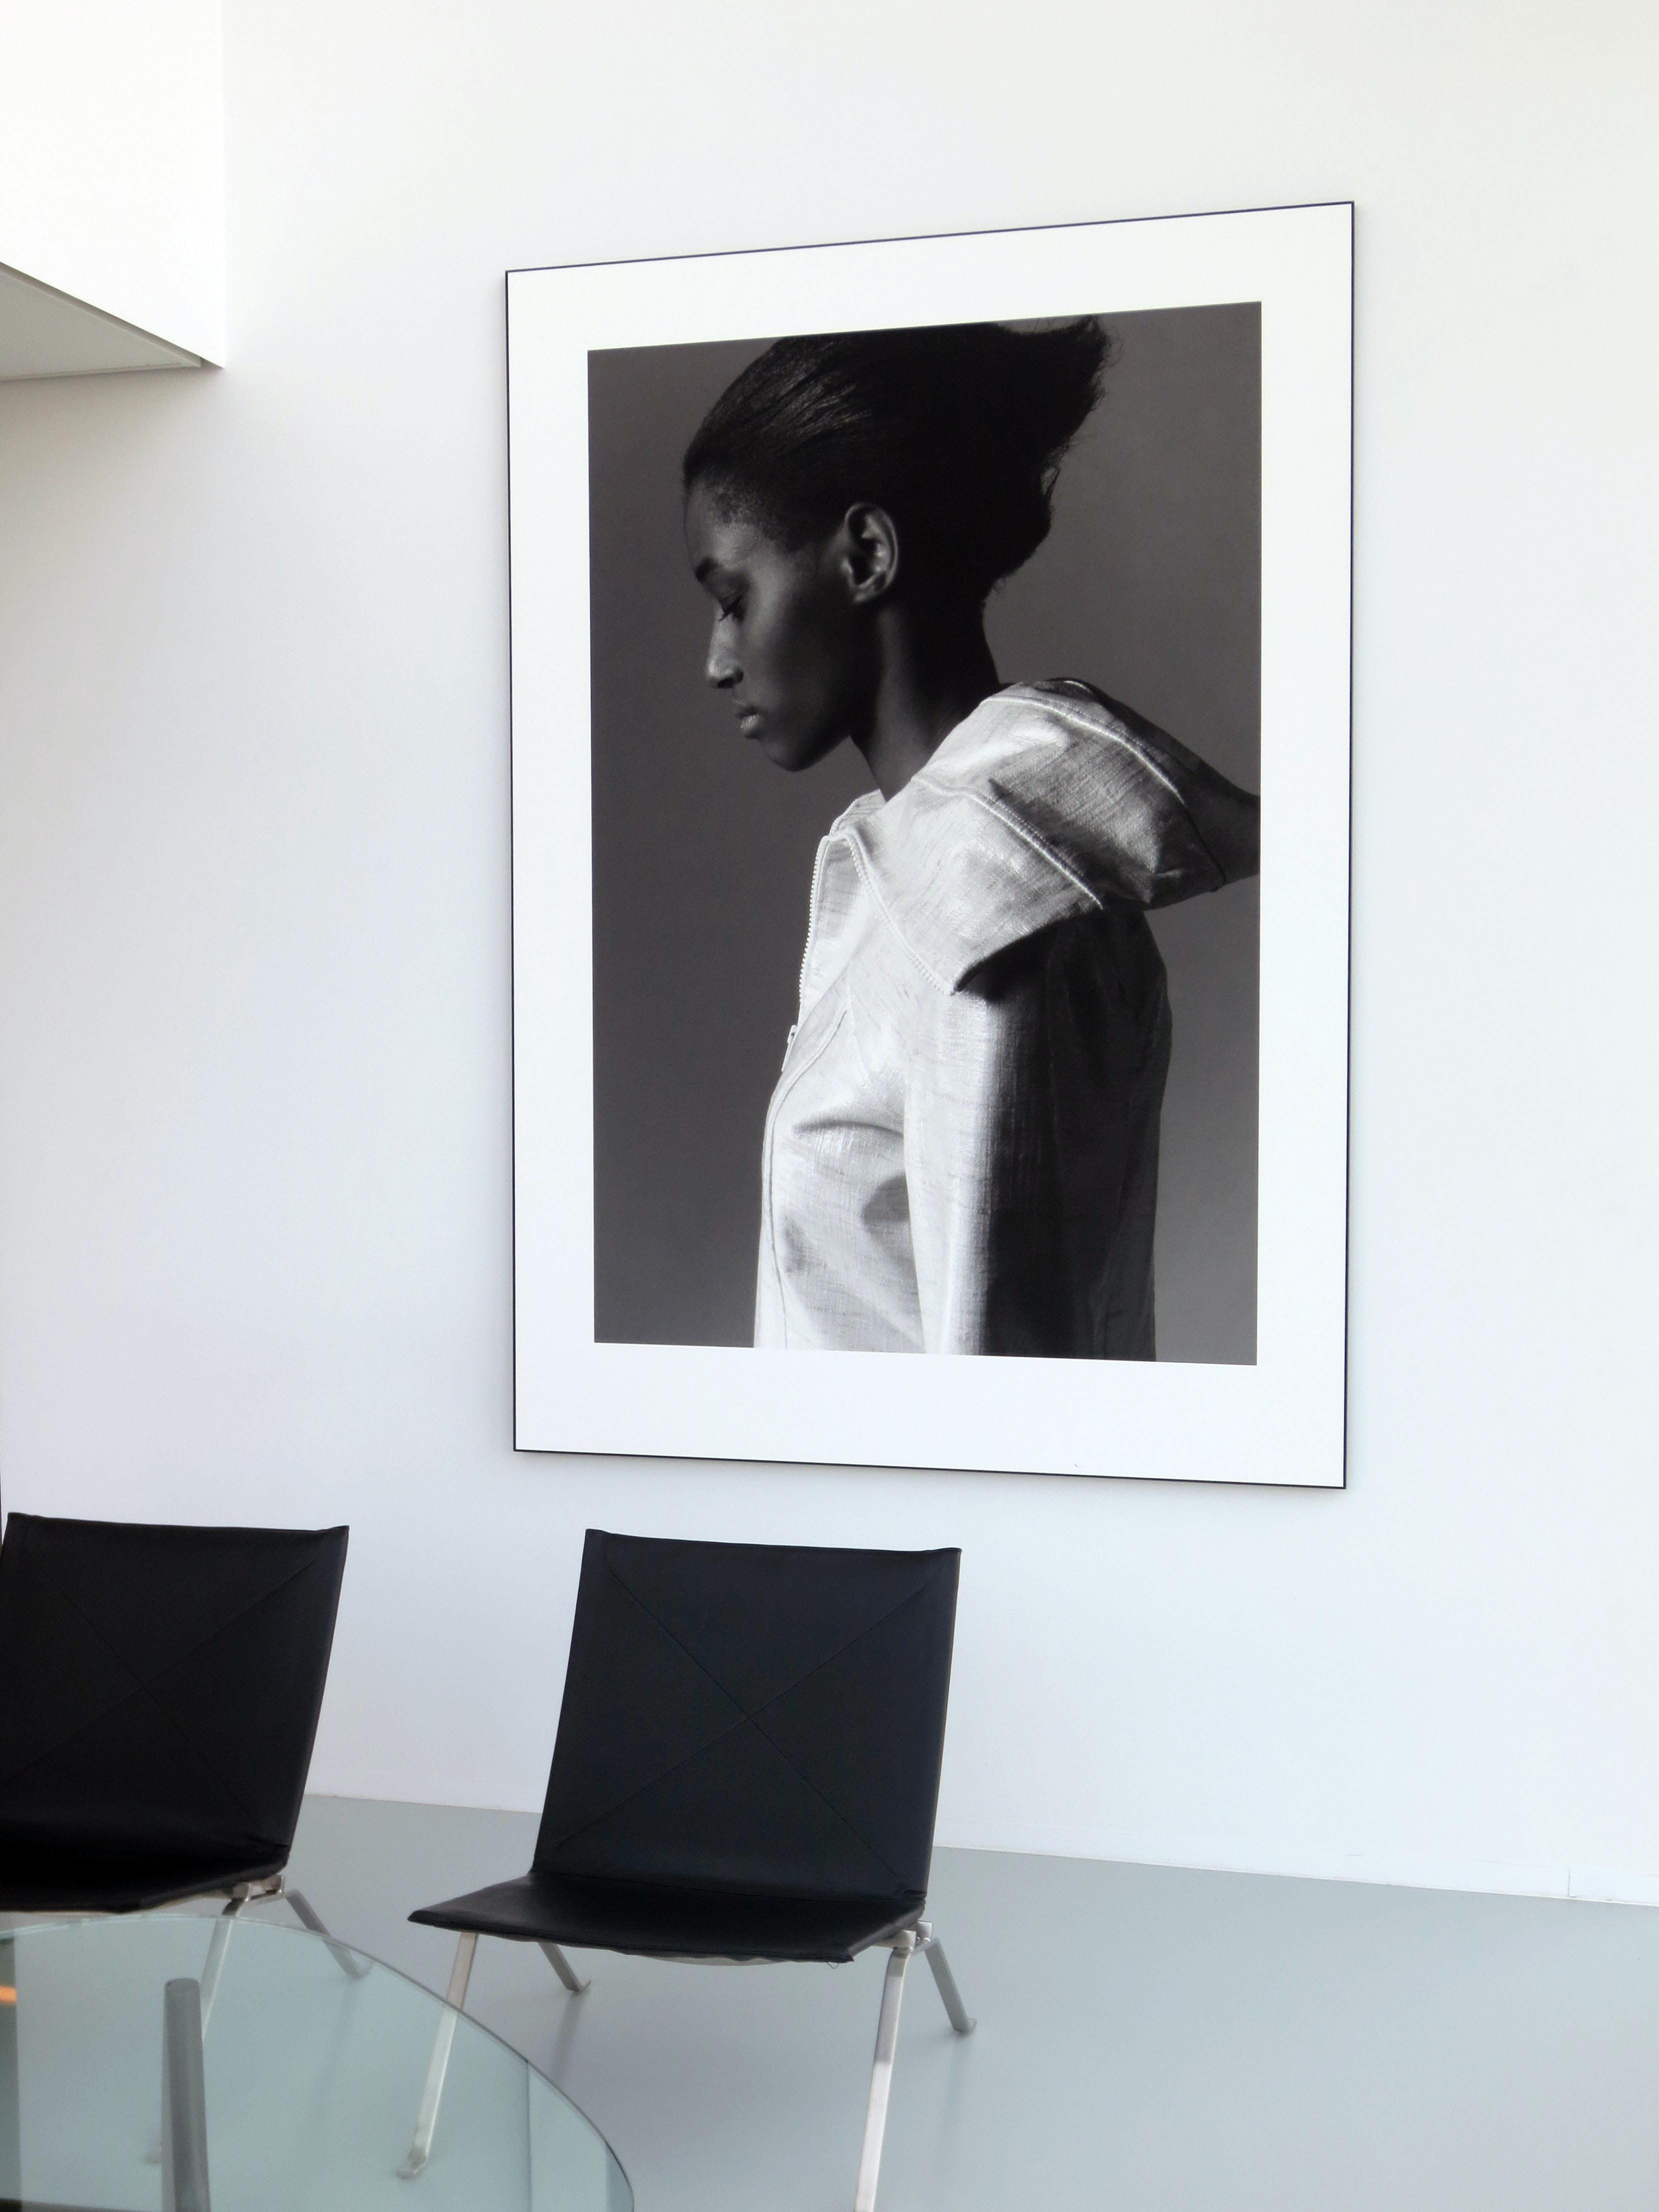 woman wearing white top photo